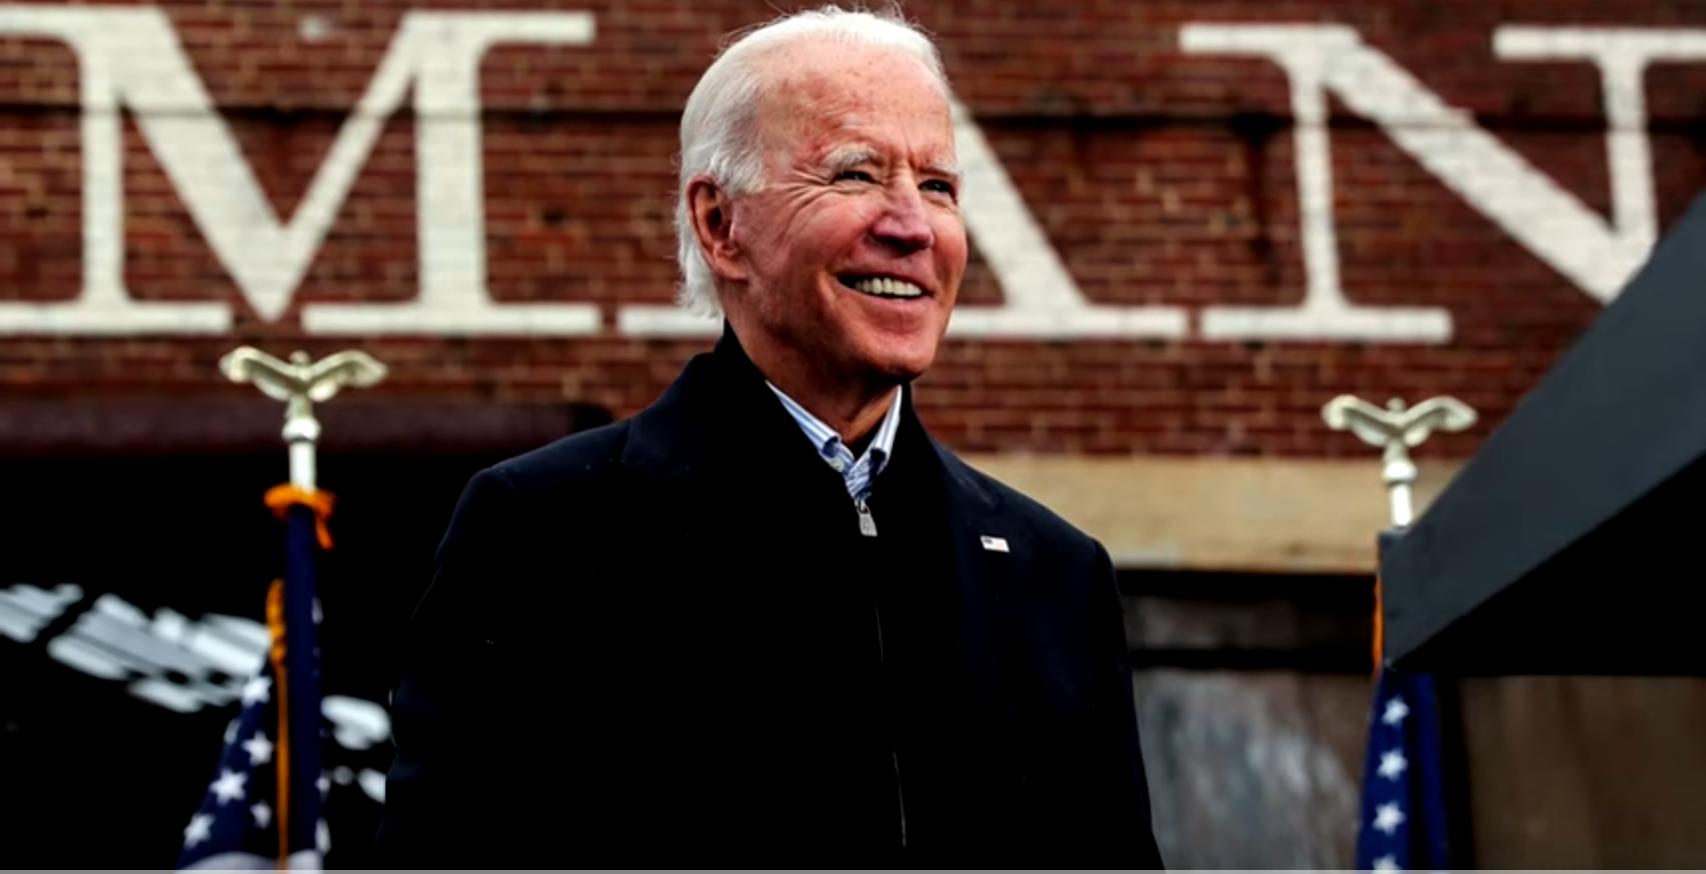 Biden-Harris Inauguration Preview